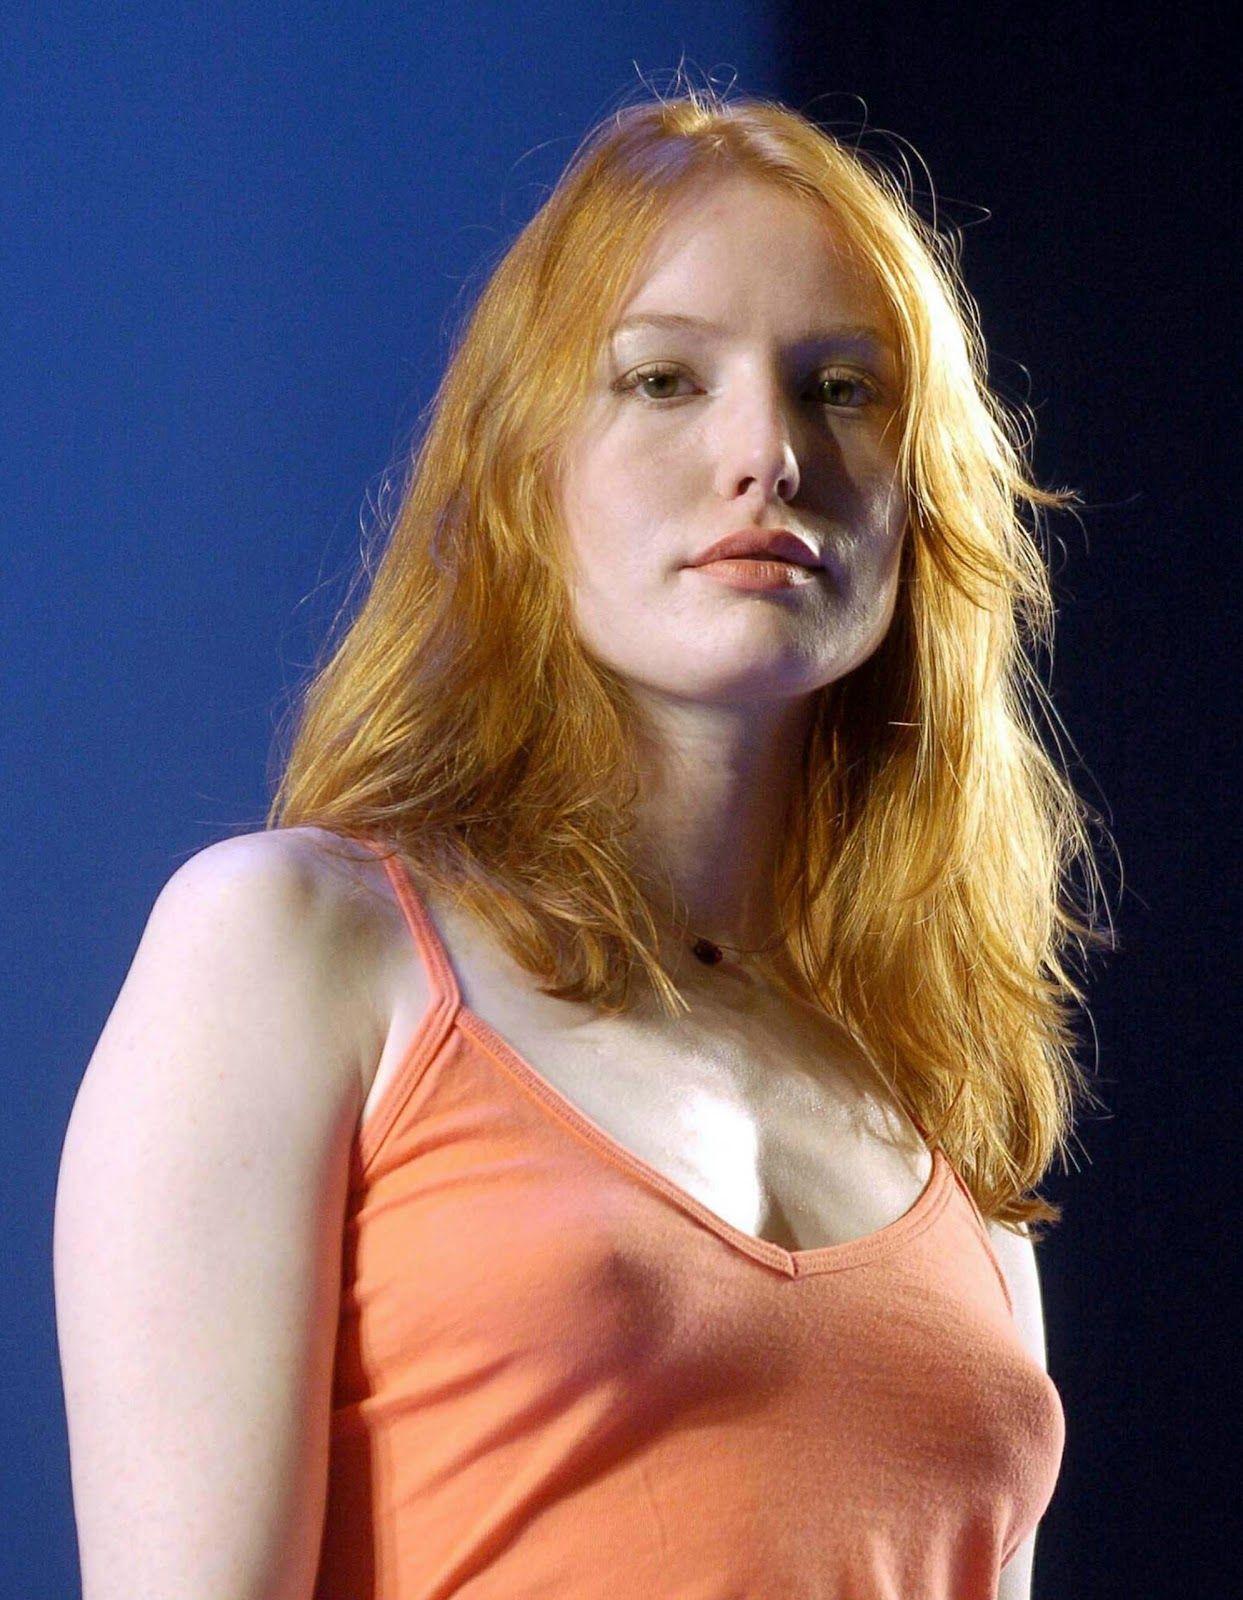 Debra Messing Braless Stunning alicia witt pokies braless nipples   celebrity pokies   pinterest